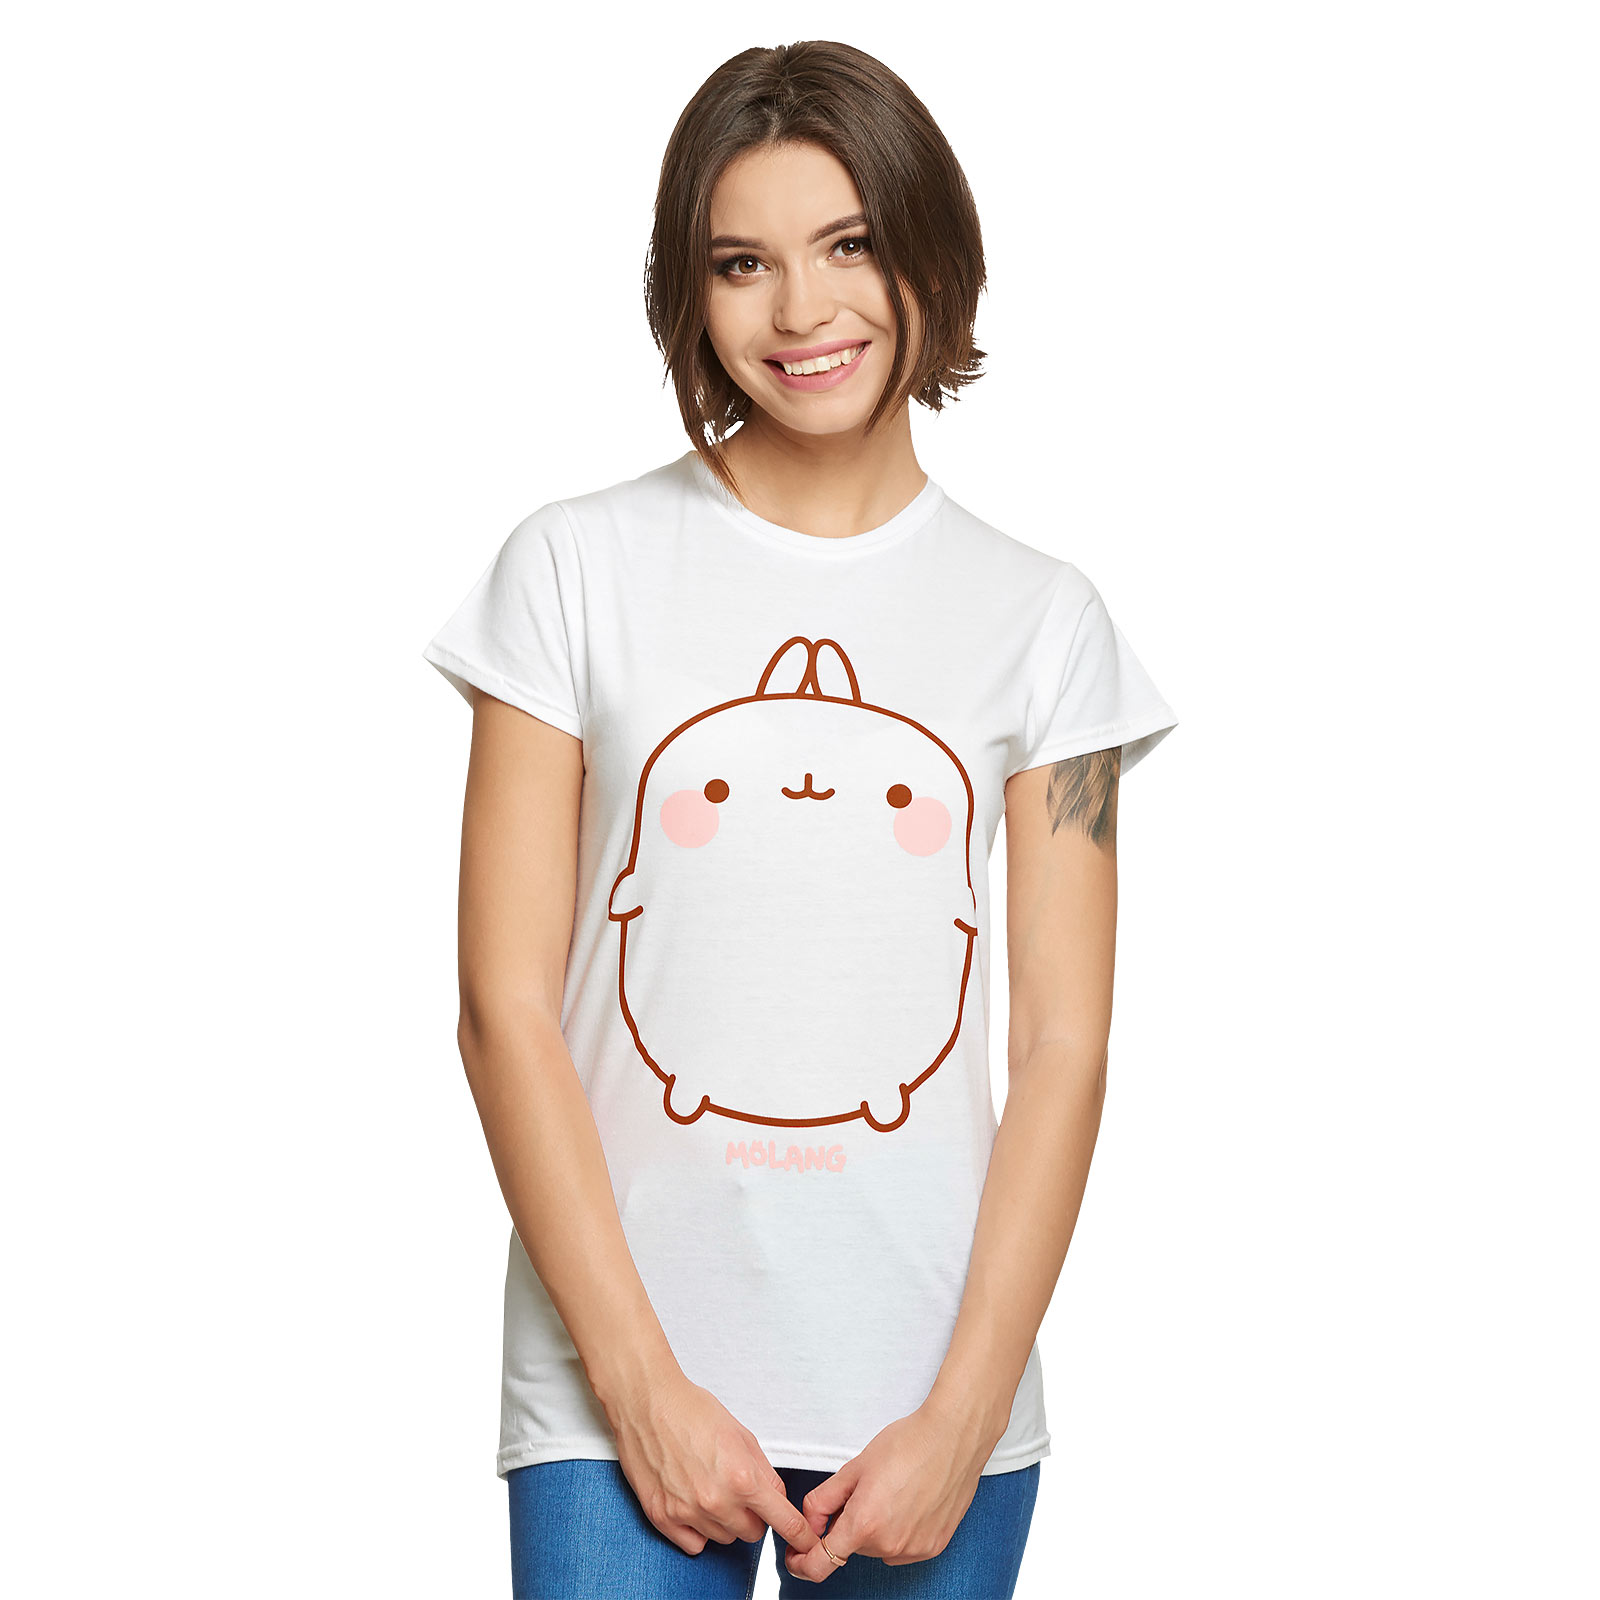 Molang - Smile T-Shirt Damen weiß